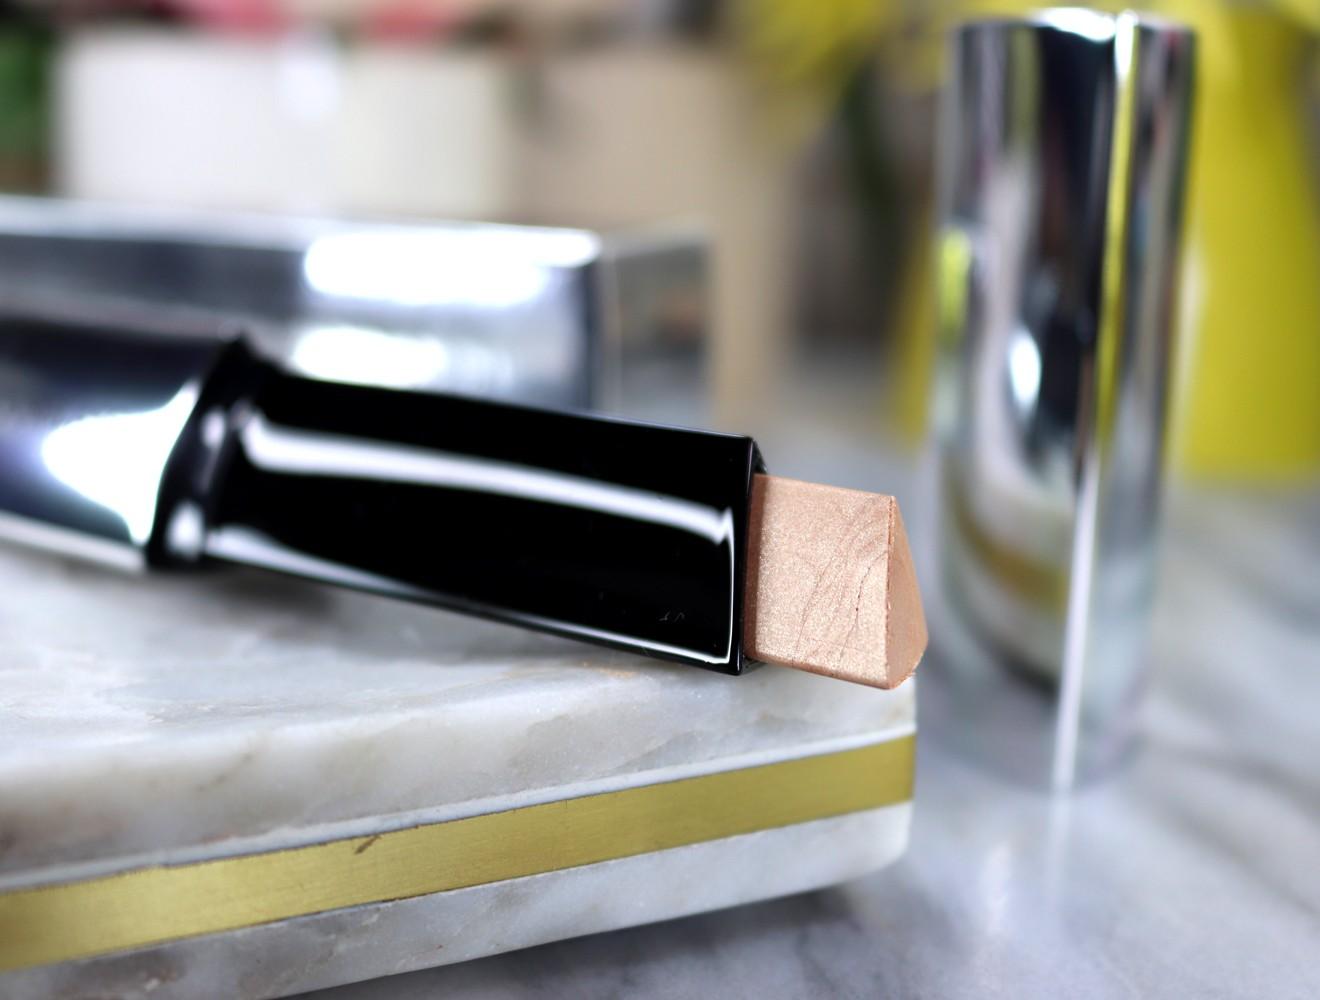 Hourglass Vanish Highlighter - Hourglass cosmetics going vegan by popular Las Vegas beauty blogger My Beauty Bunny